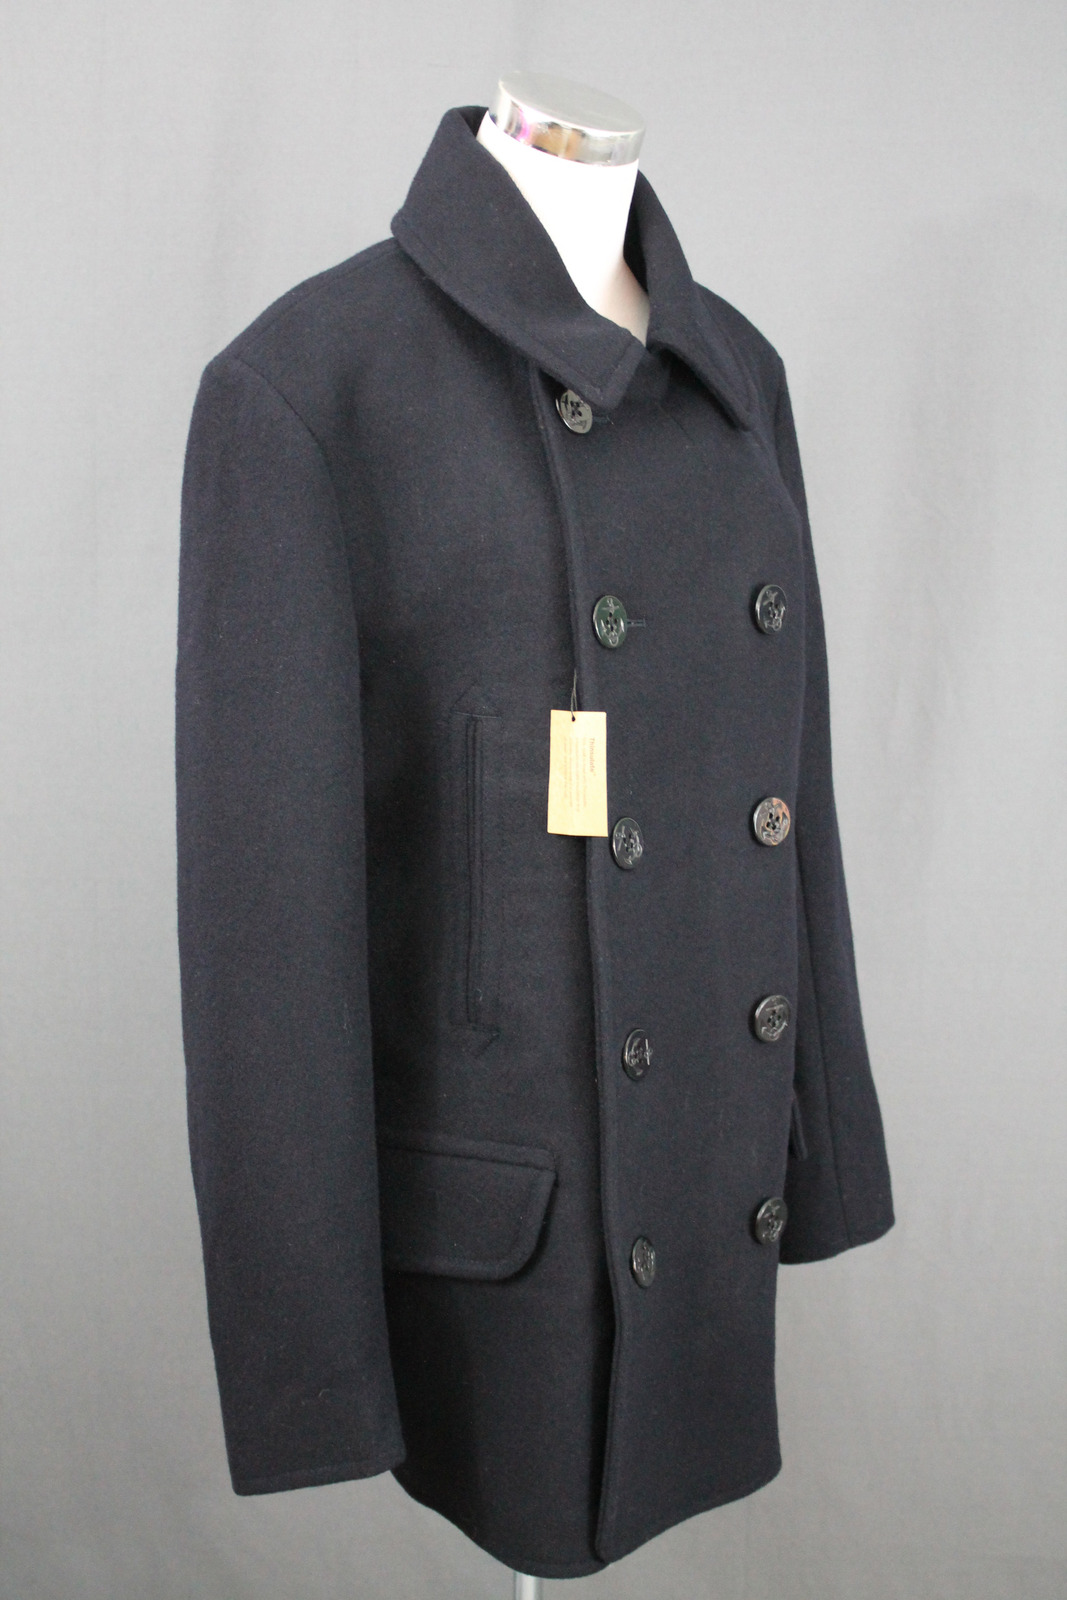 J.Crew Mens Dock Peacoat $288 Wool XS Navy Winter Coat Thinsulate